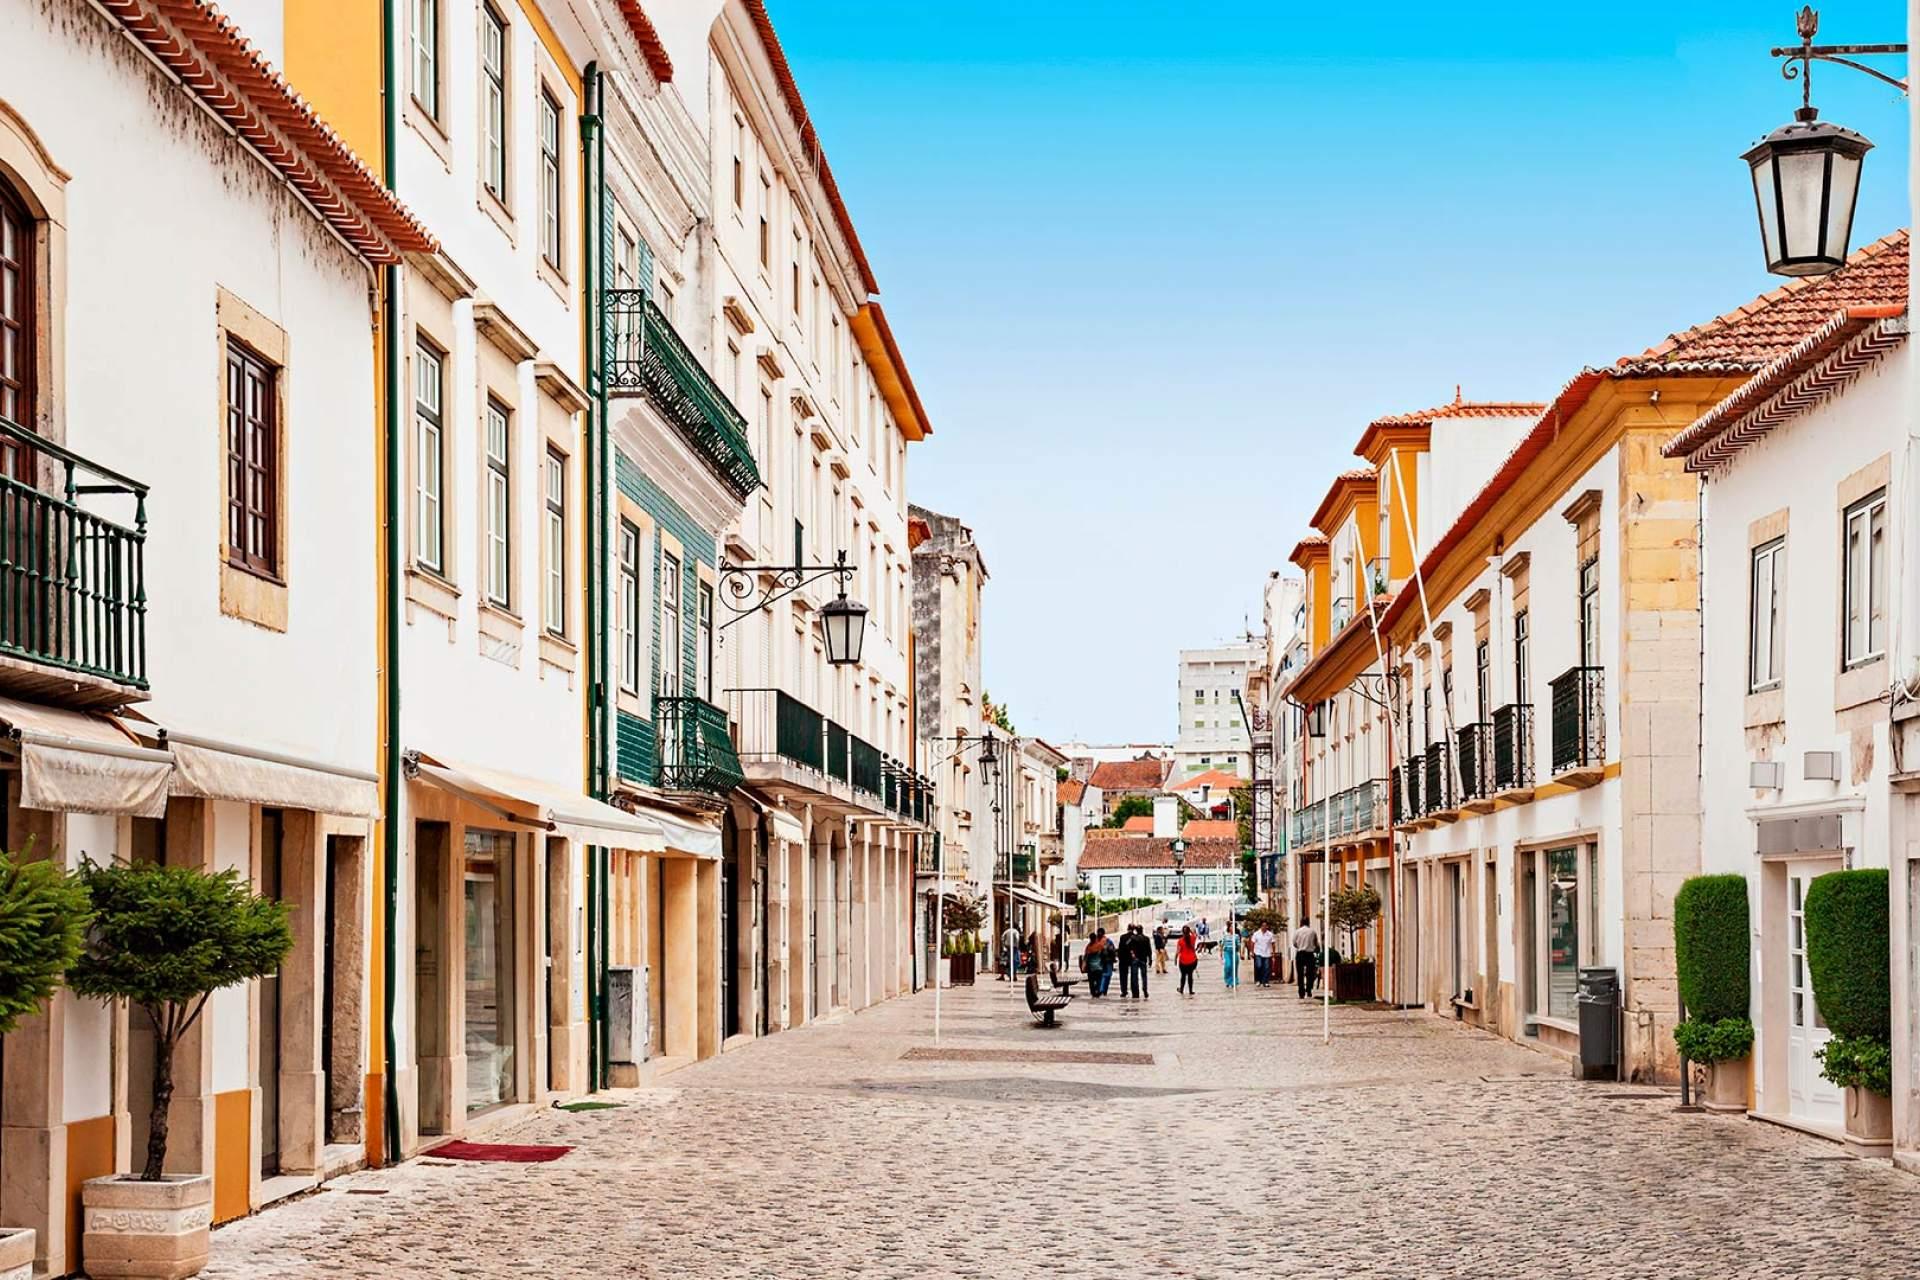 Rua em Tomar / Tomar / saiko3p_Shutterstock